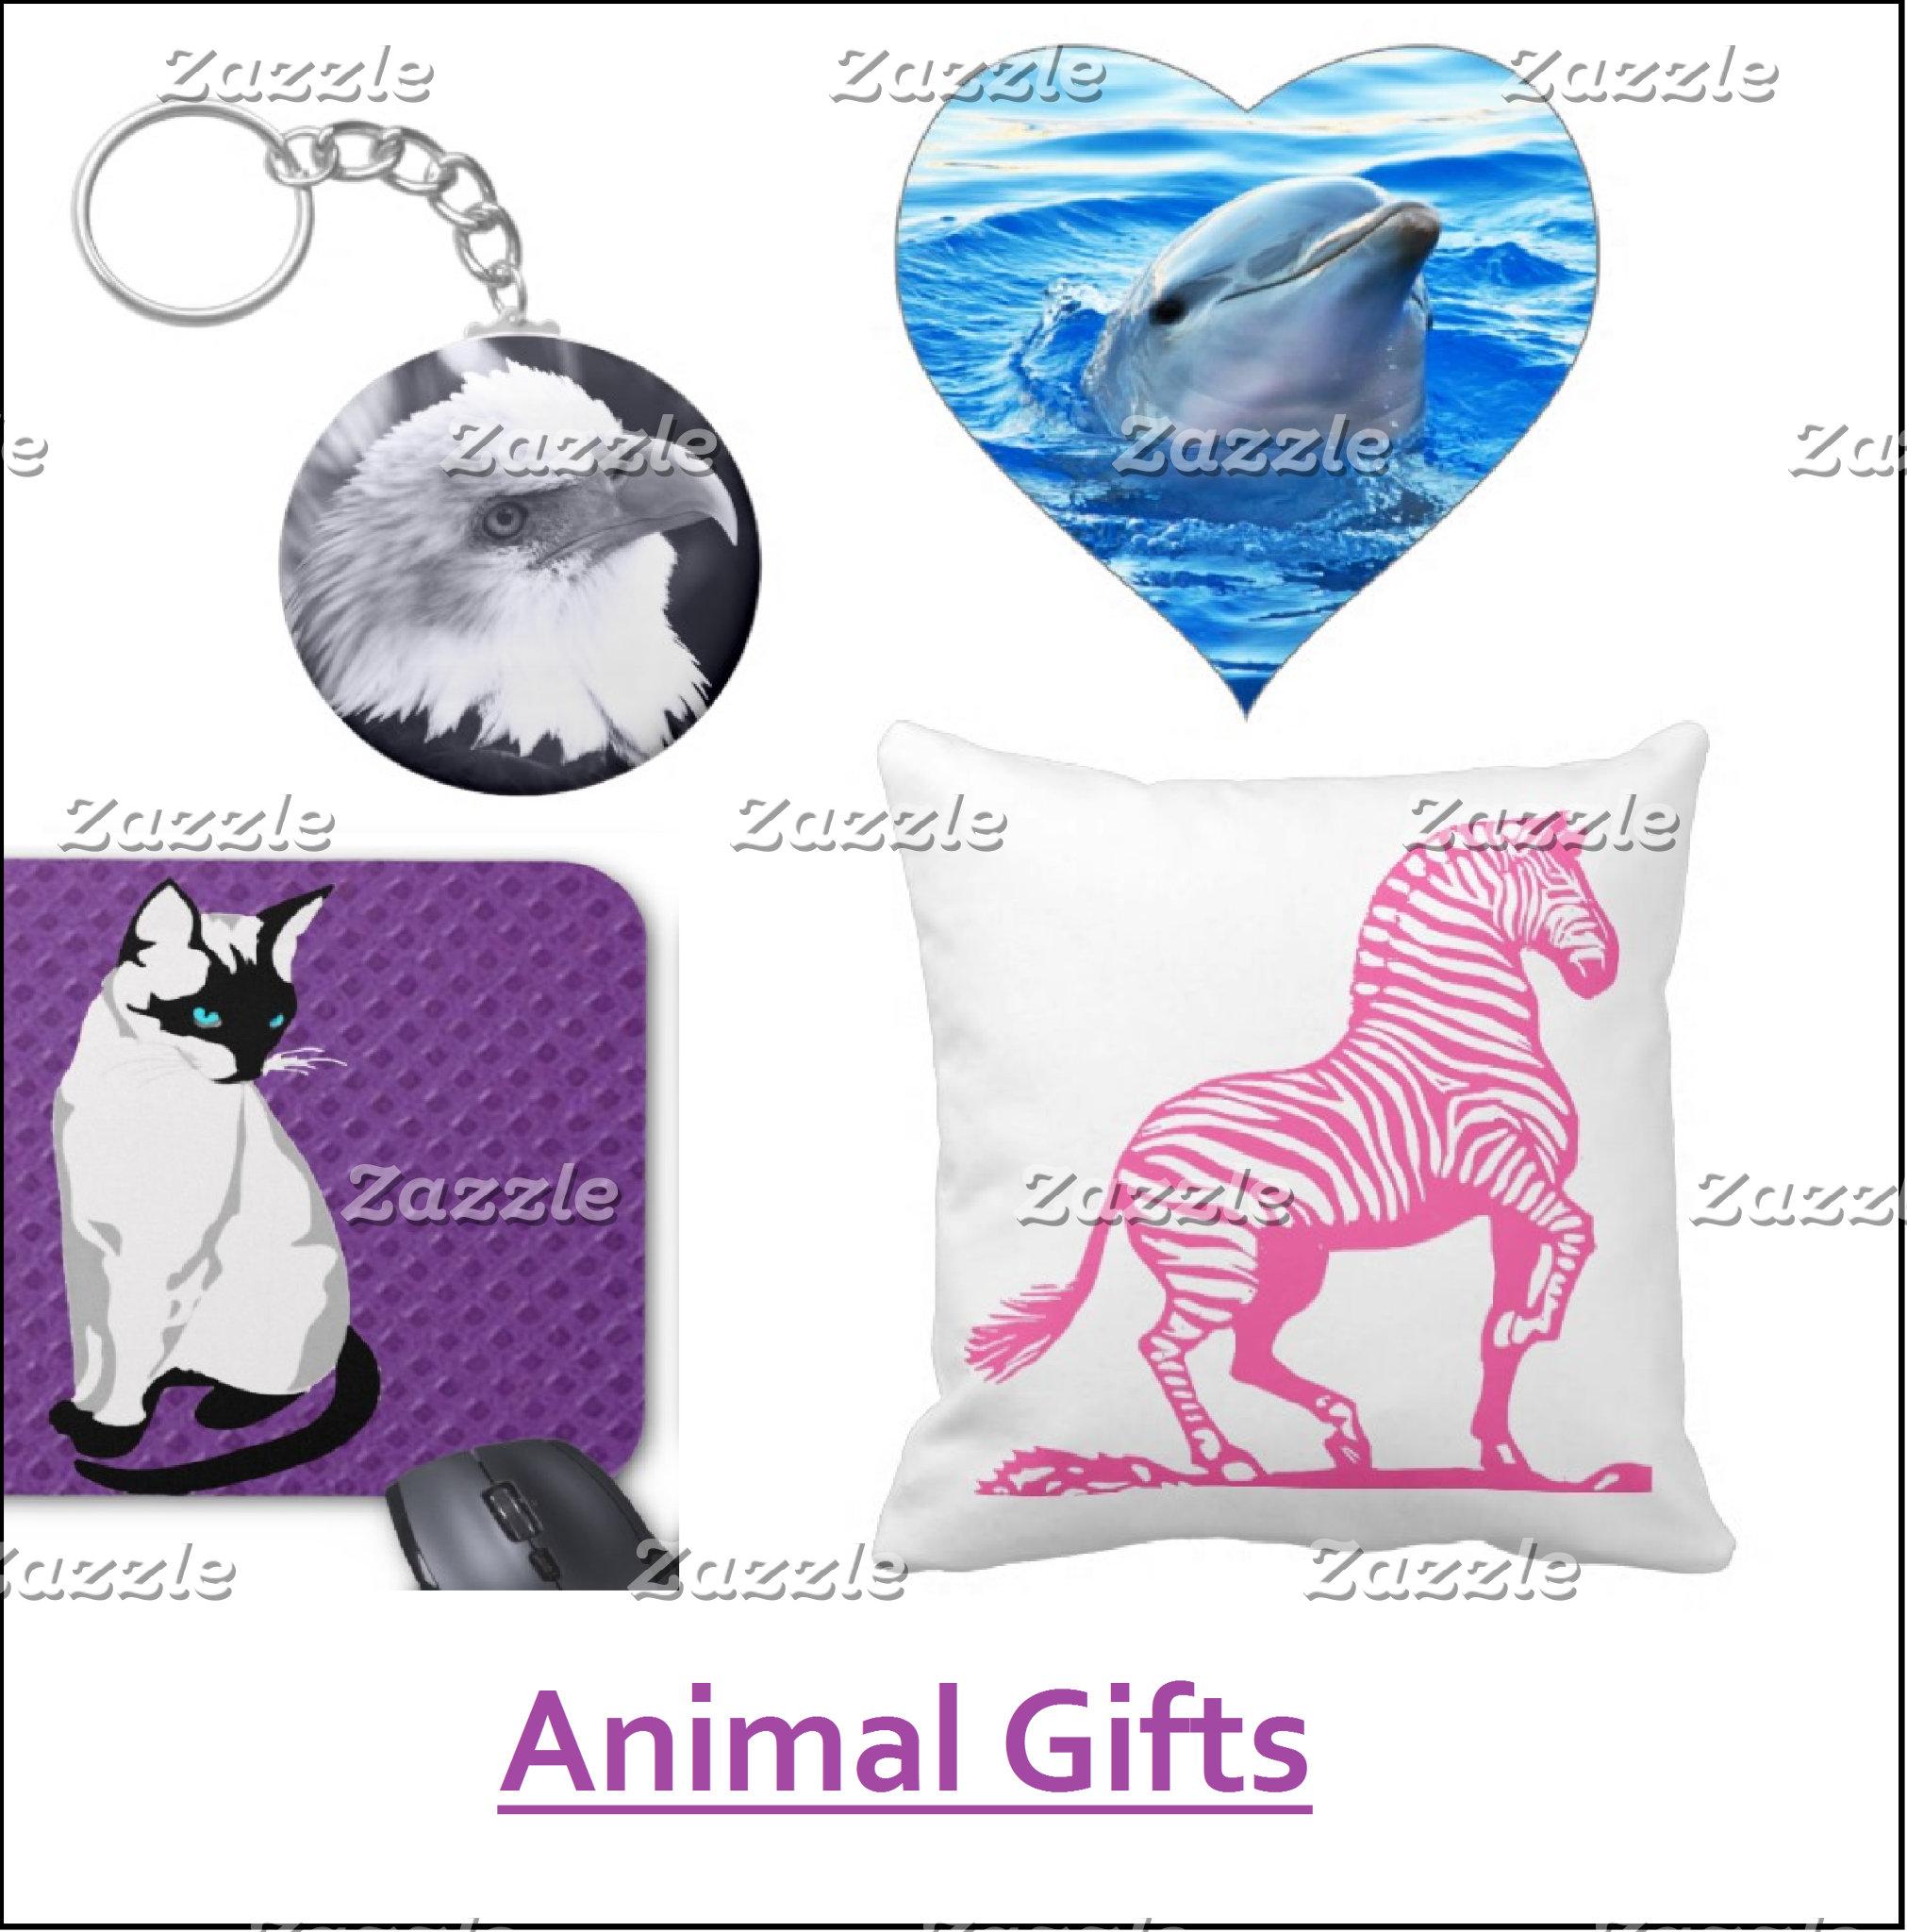 Animal Gifts